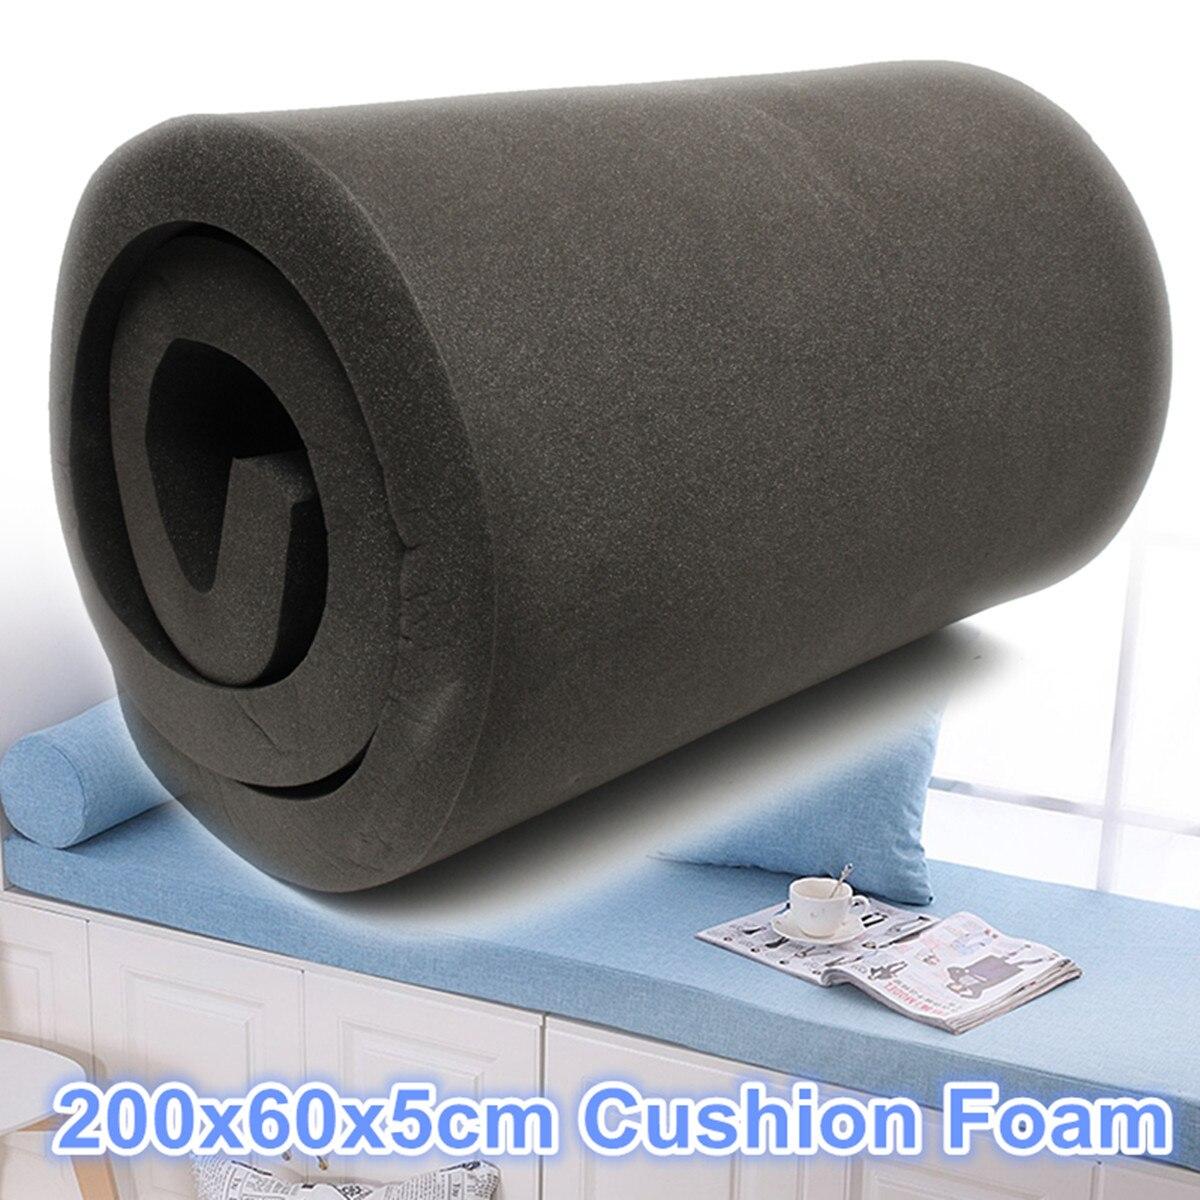 200x60x5cm High Density Seat Foam Replacement Upholstery Cushion Foam